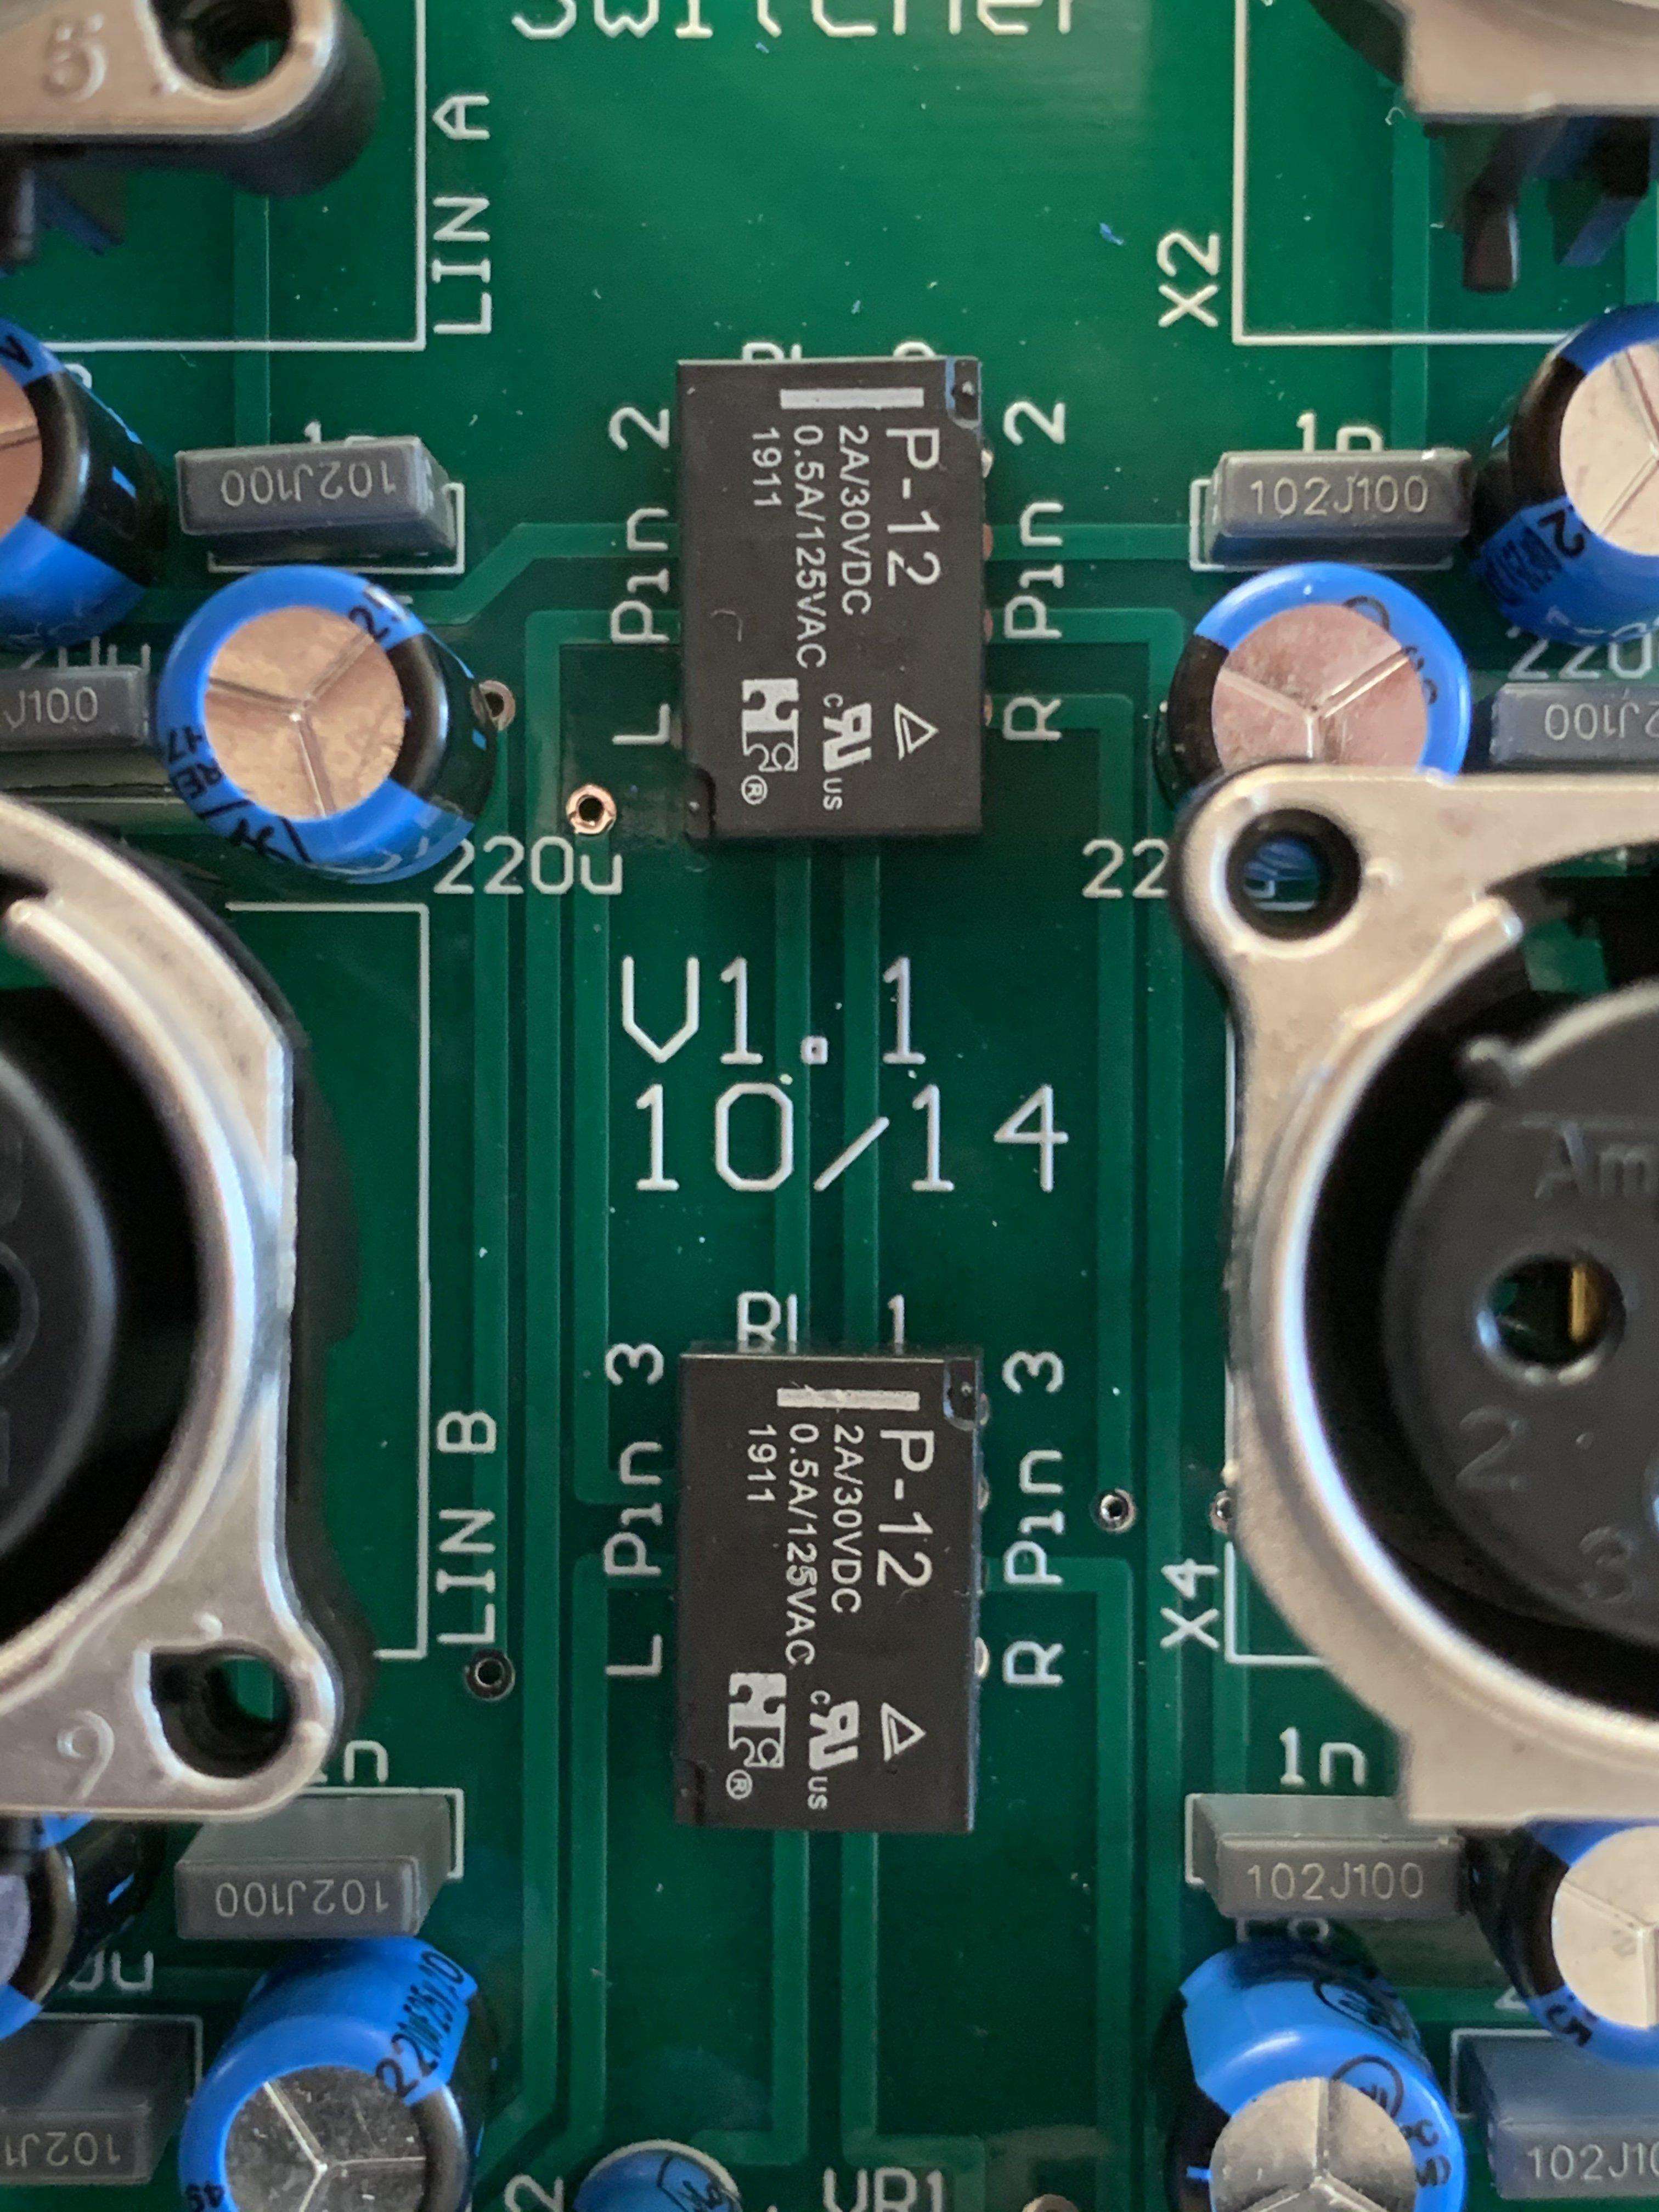 16B35B7D-2EDA-467B-BD02-3008B7E95C53.jpeg